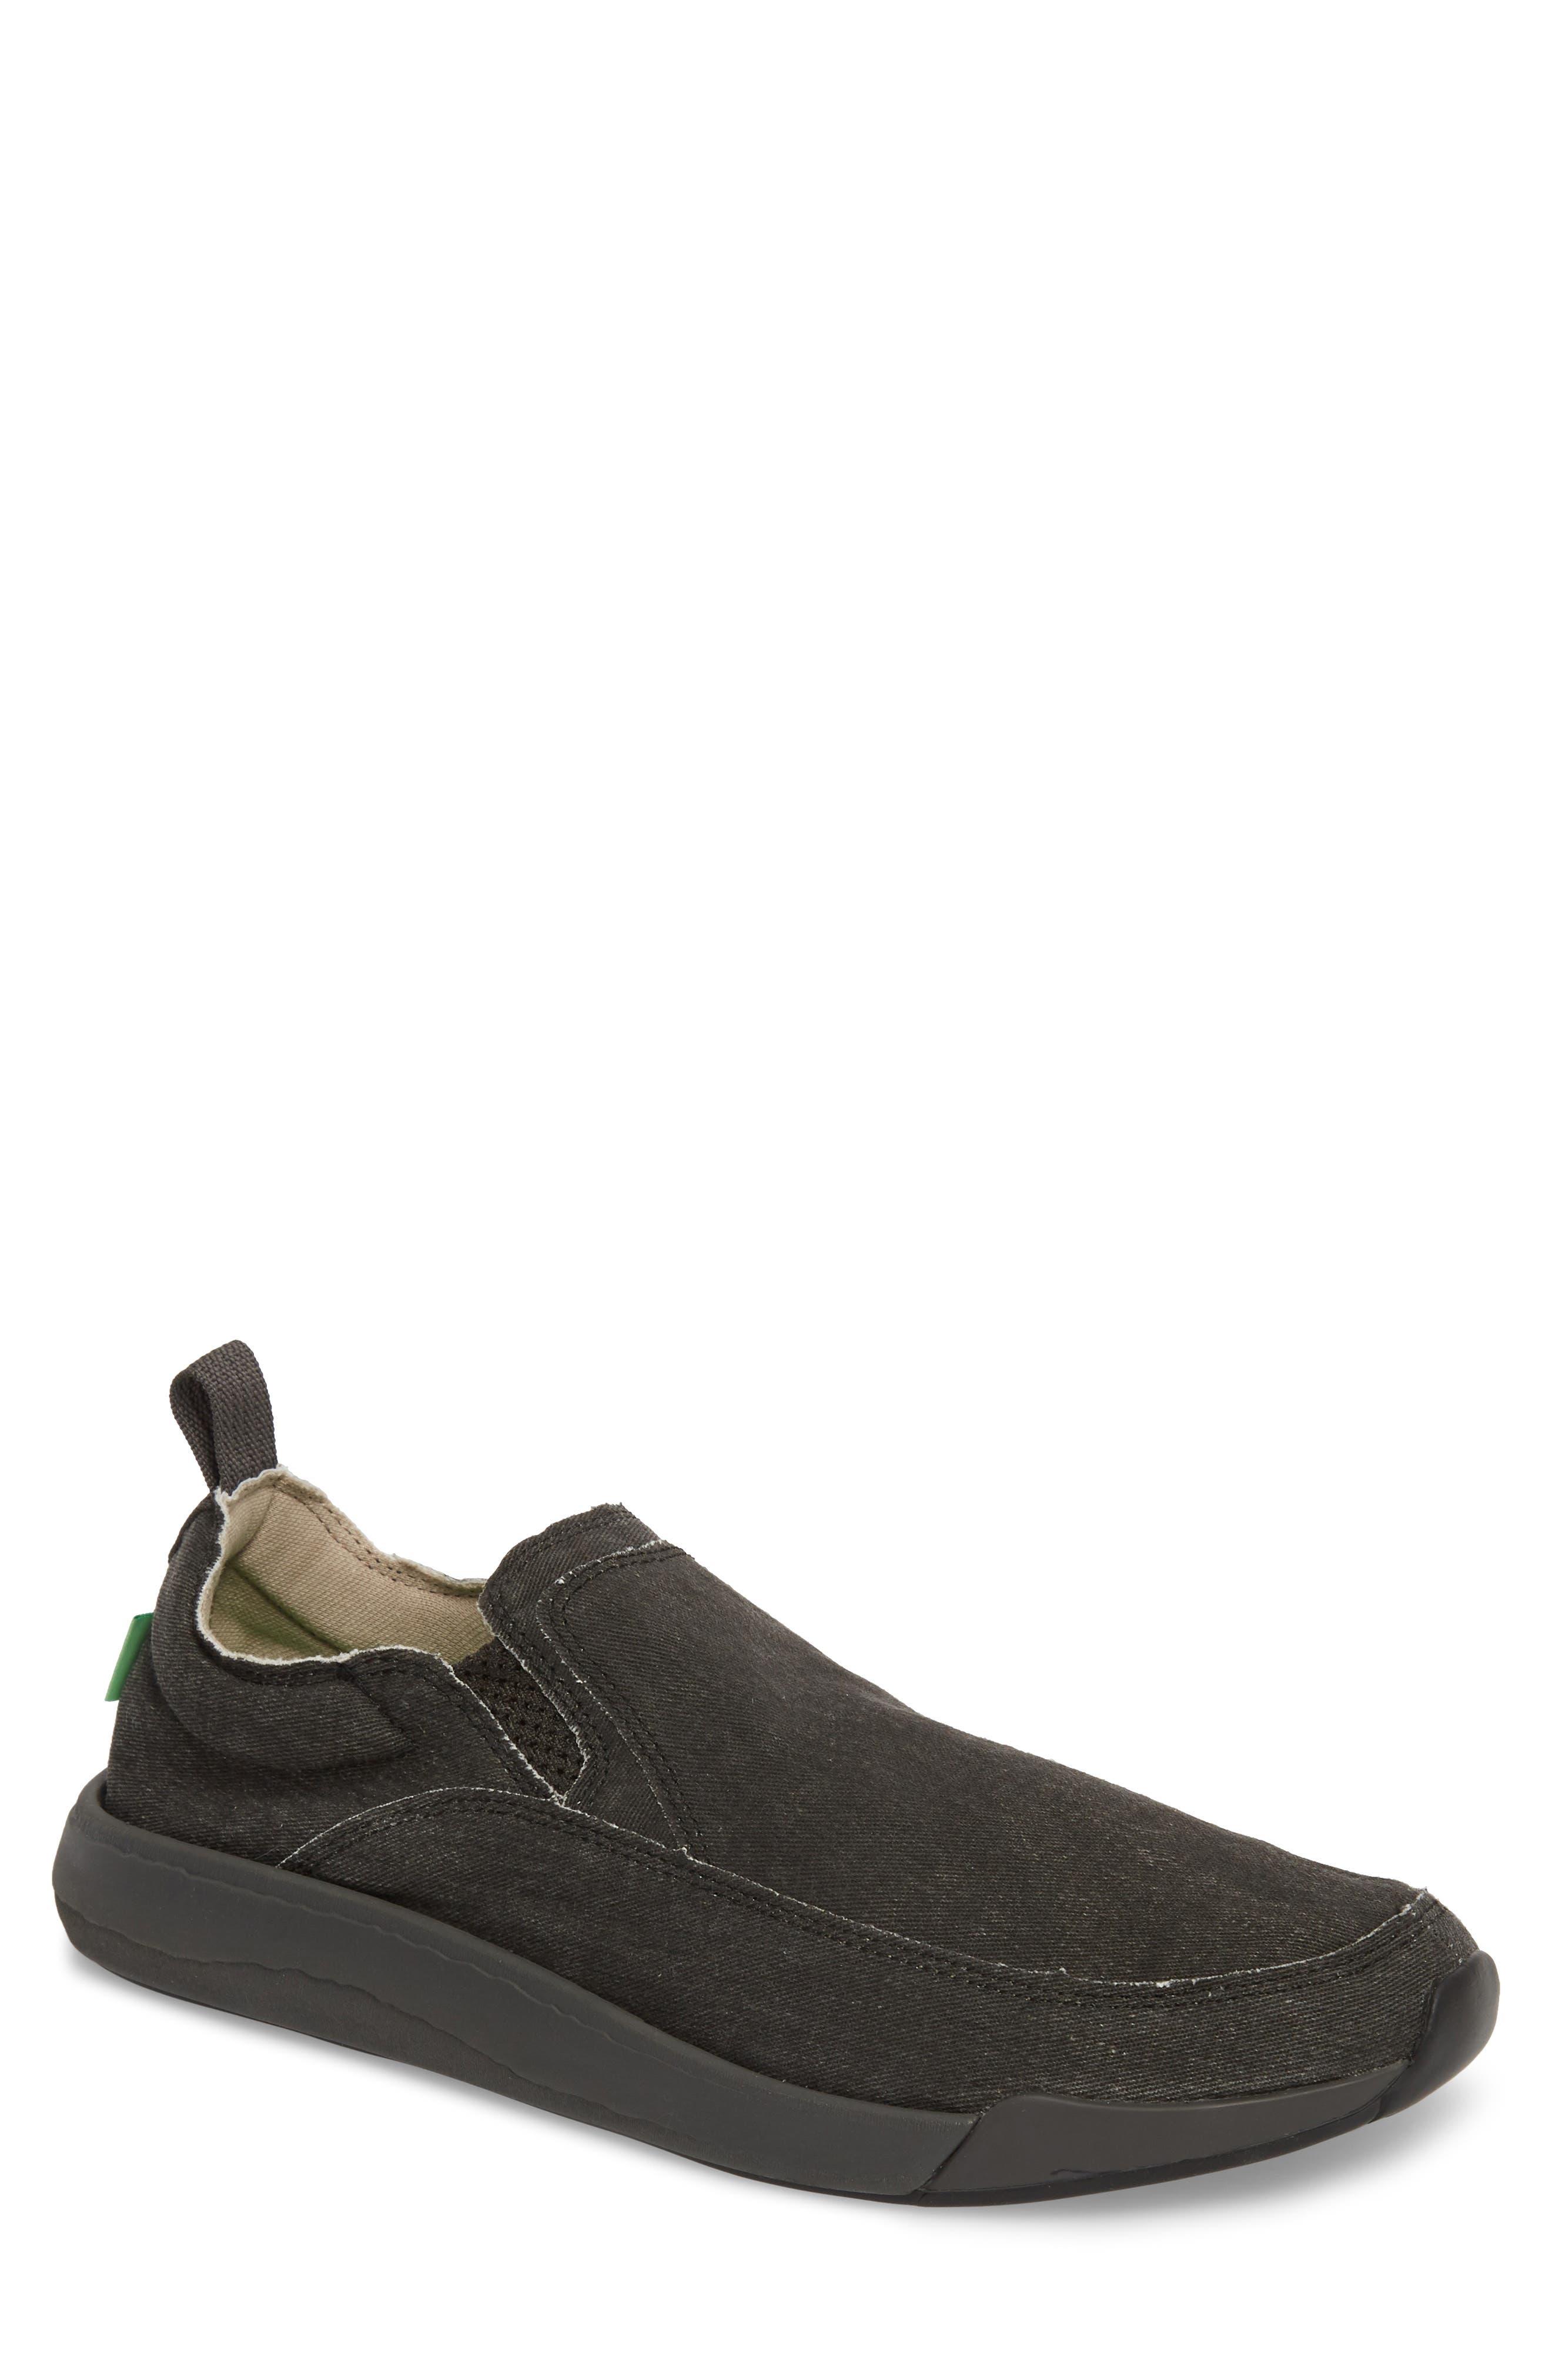 Chiba Quest Slip-On Sneaker,                             Main thumbnail 1, color,                             Black/ Black